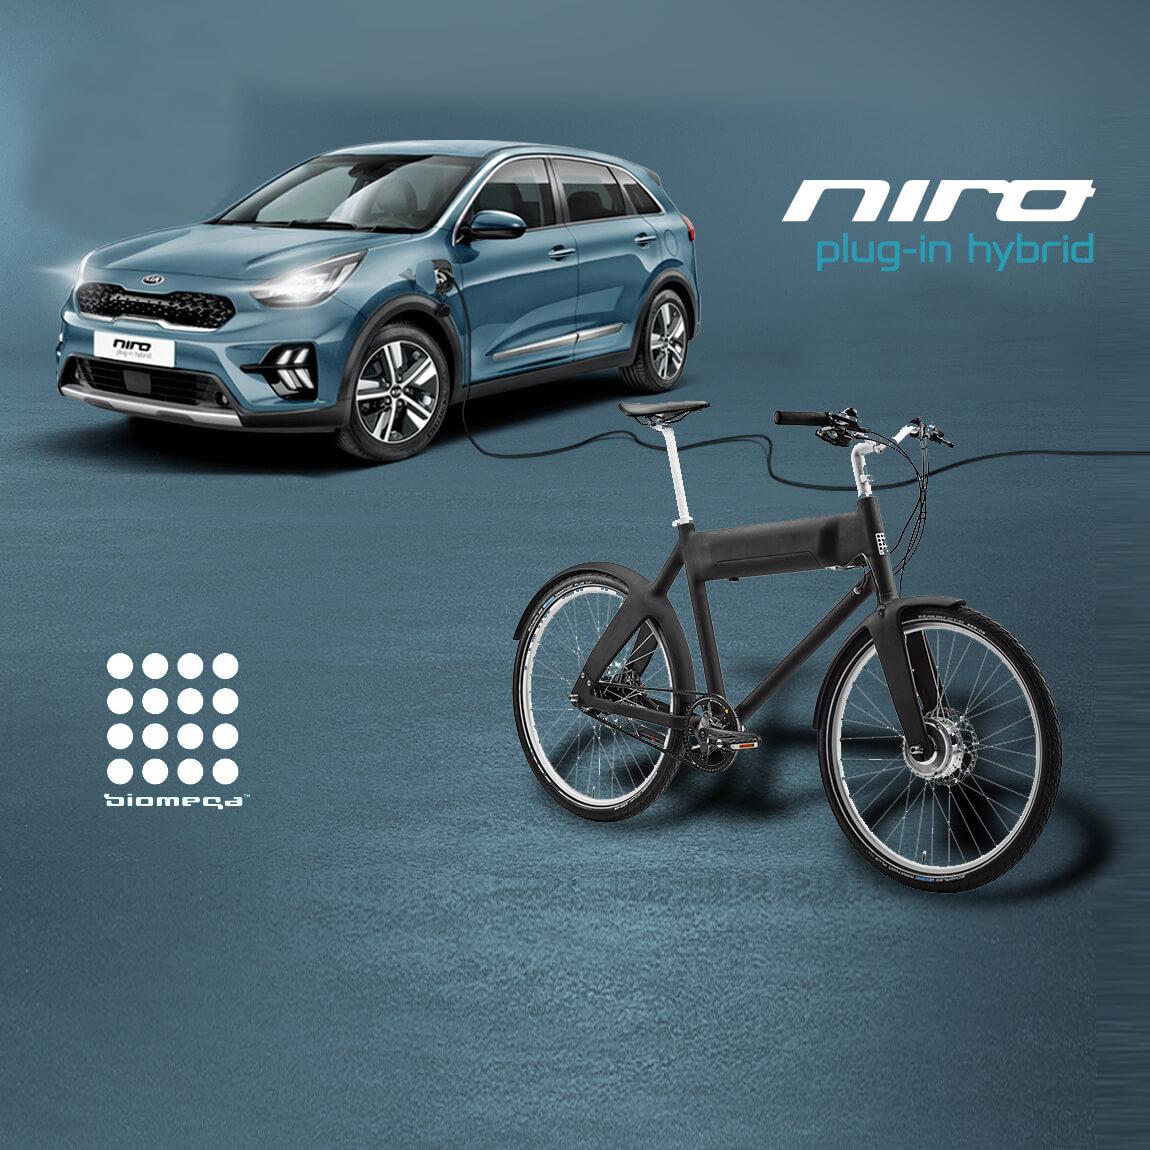 UGGERHØJ KIA NIRO plug-in hybrid